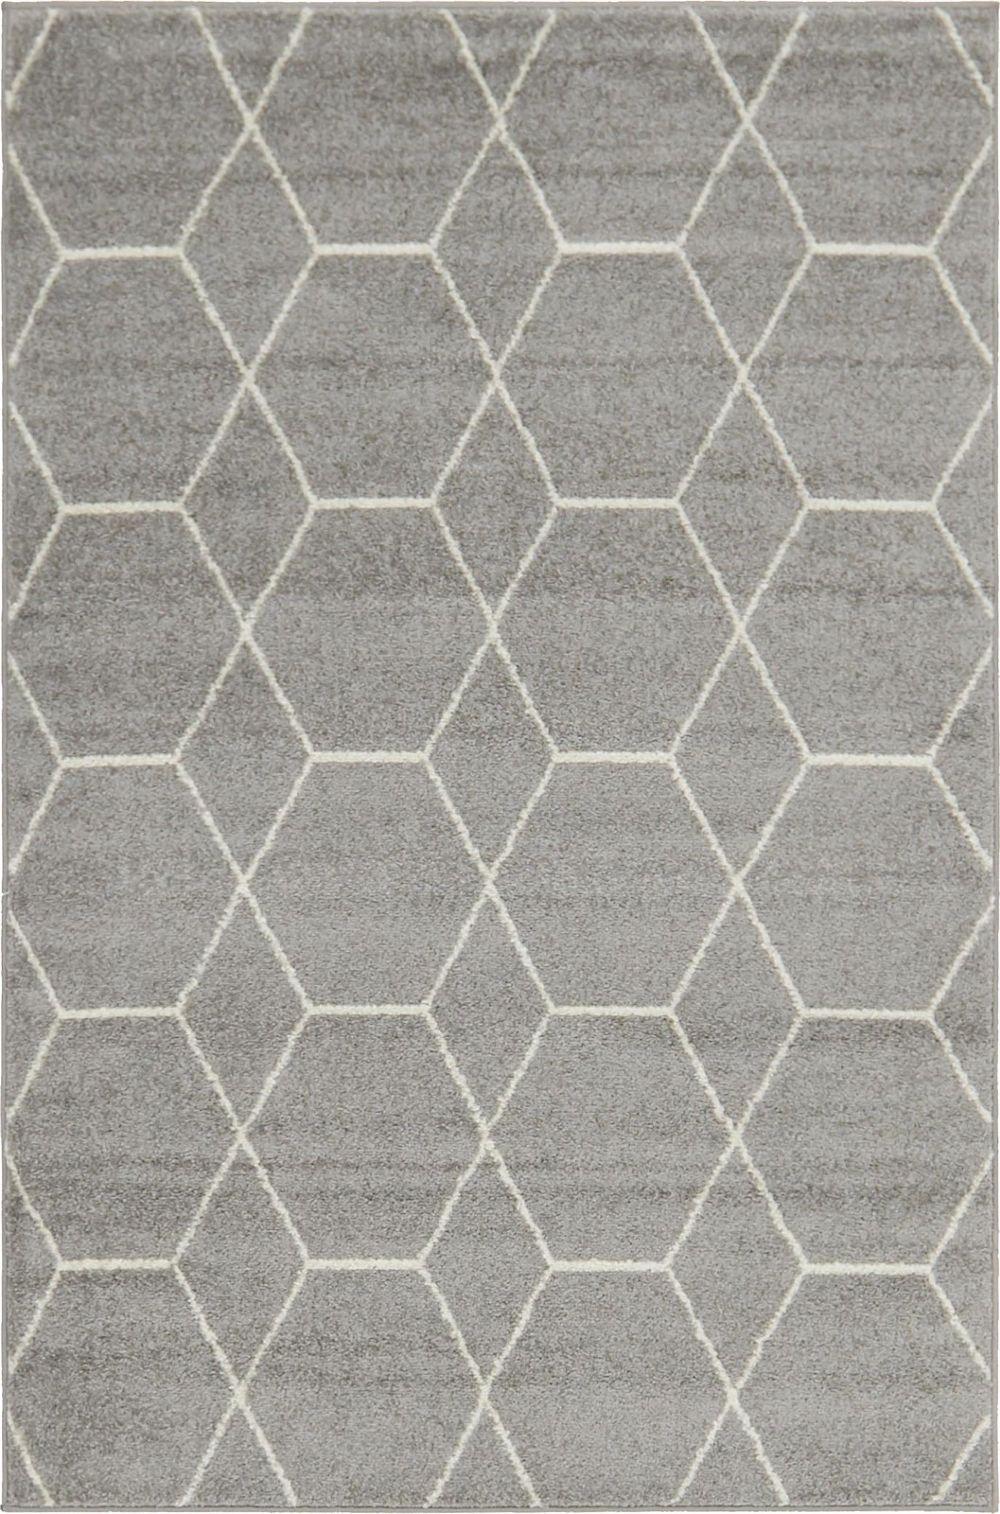 rugpal tellaro contemporary area rug collection